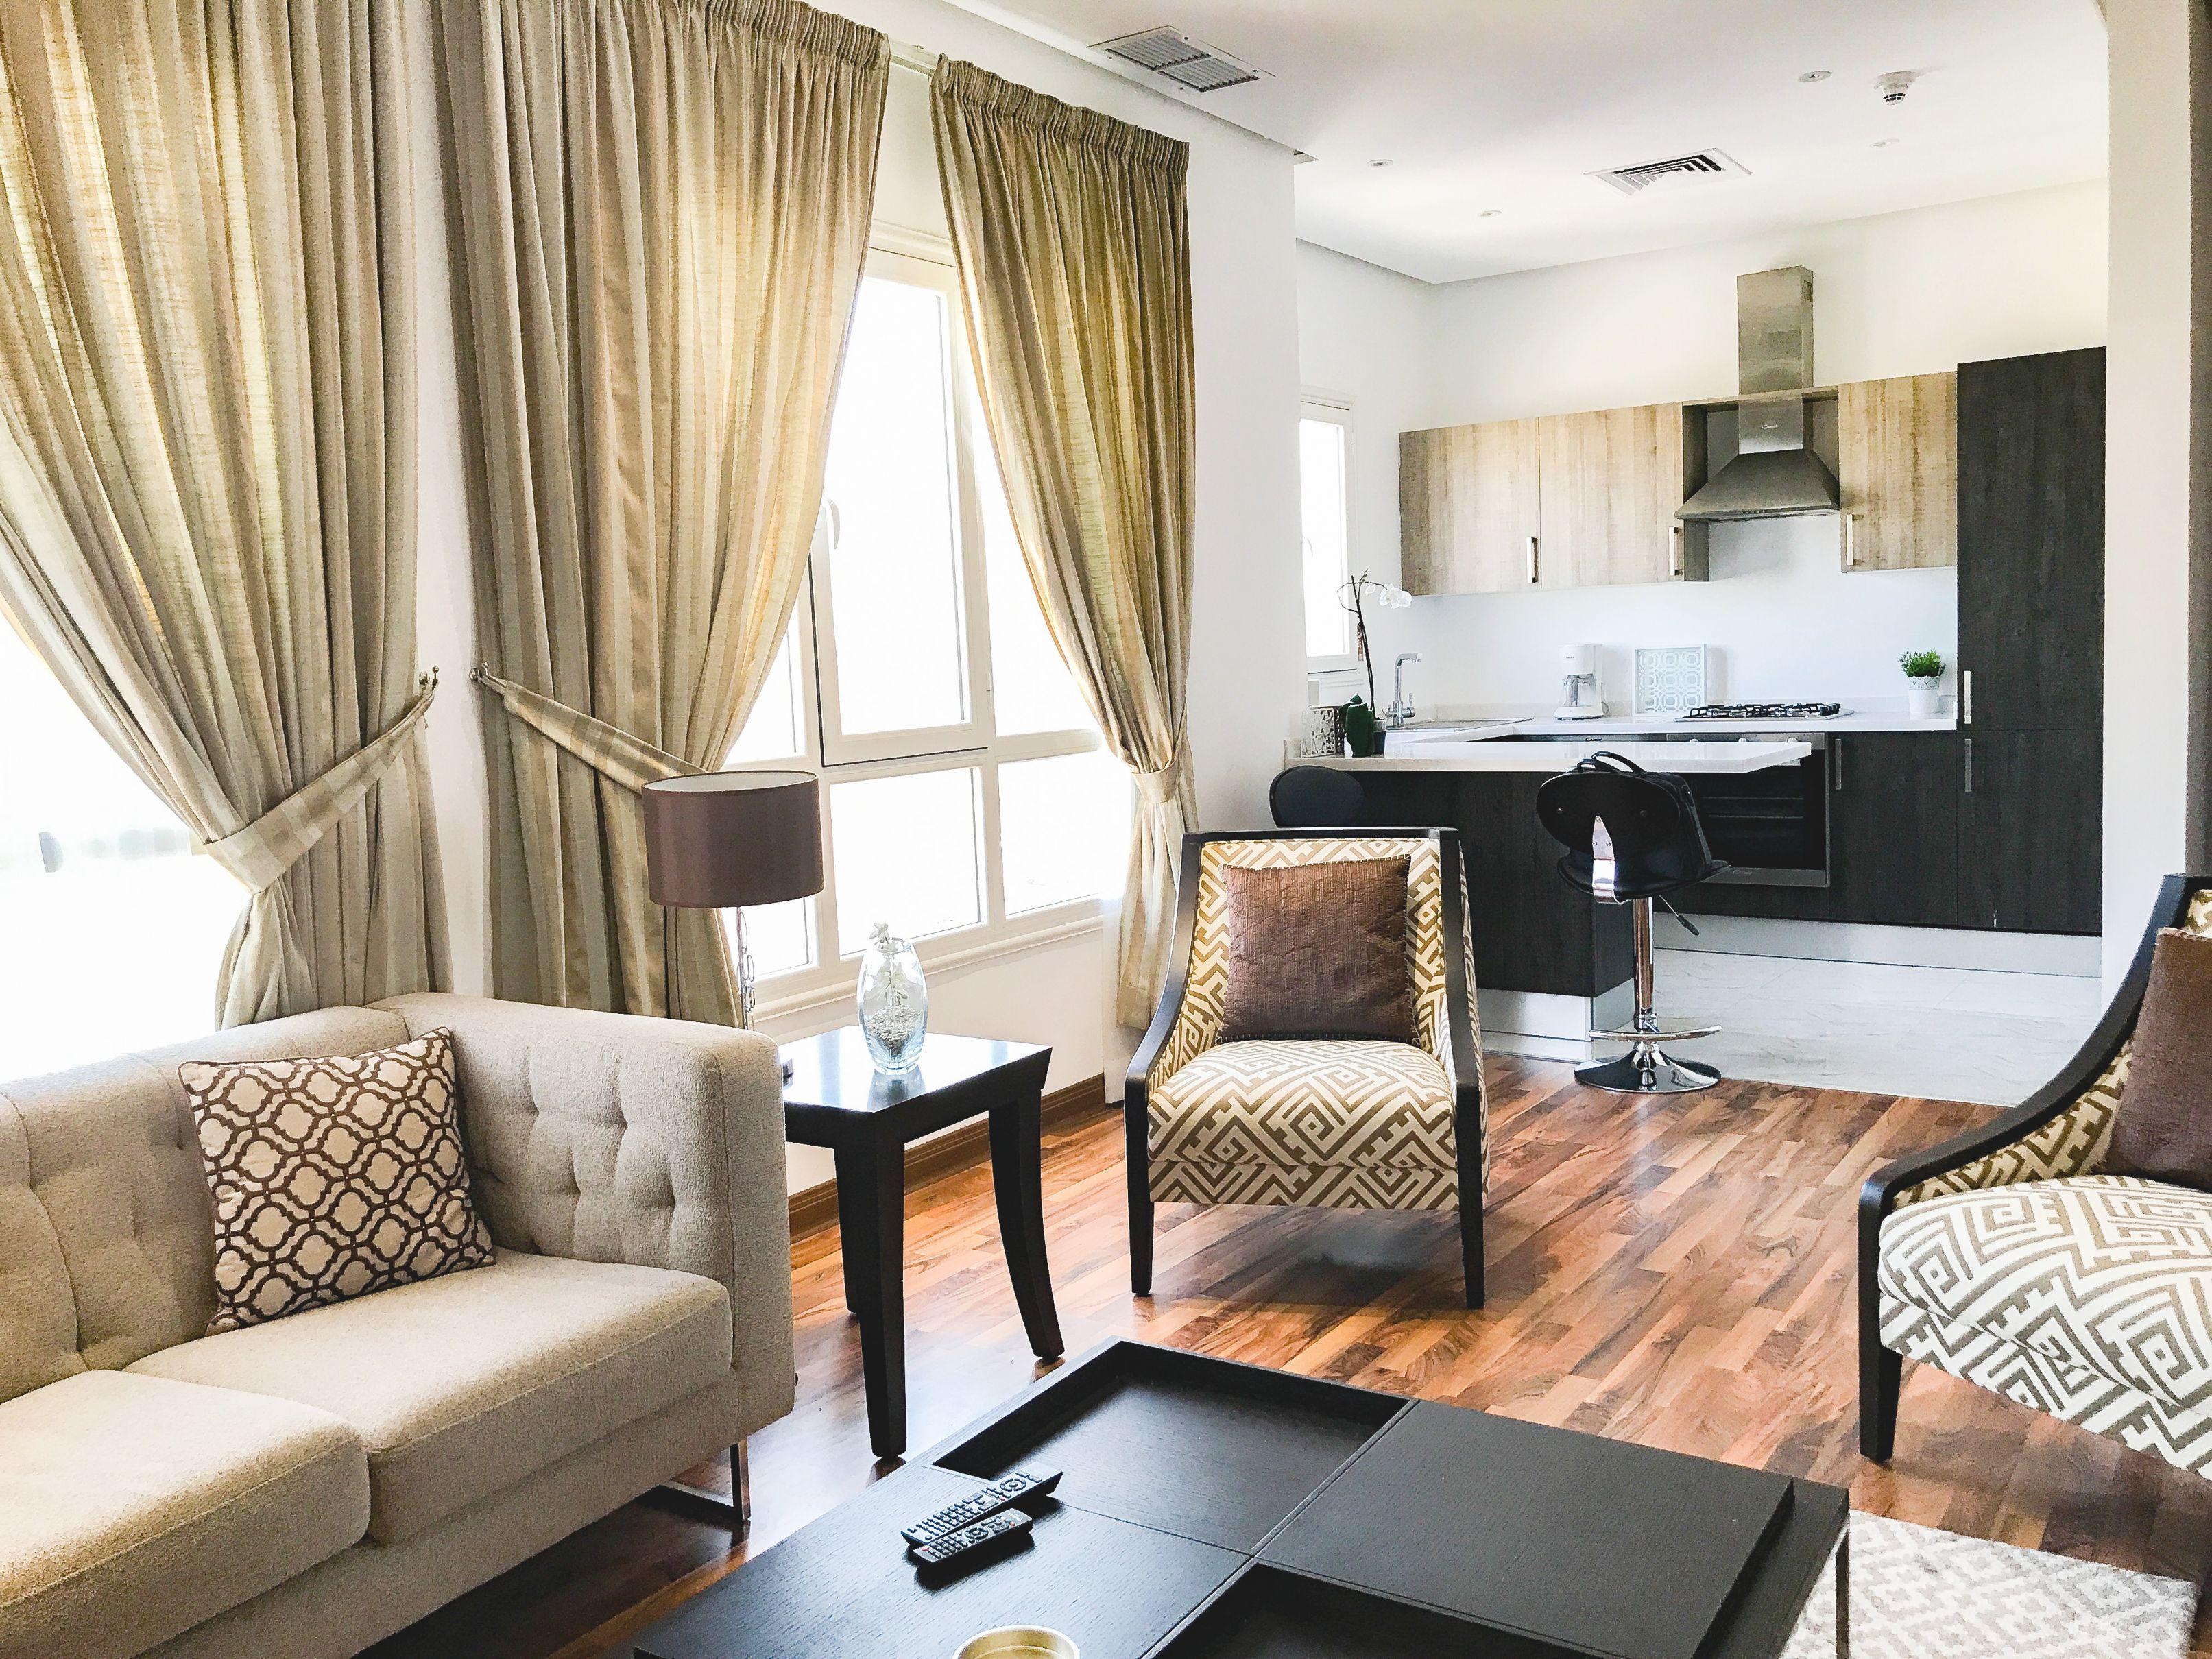 One Bedroom Furnished Apartment Rent Salmiya, Kuwait, For regarding Luxury One Bedroom Furnished Apartment